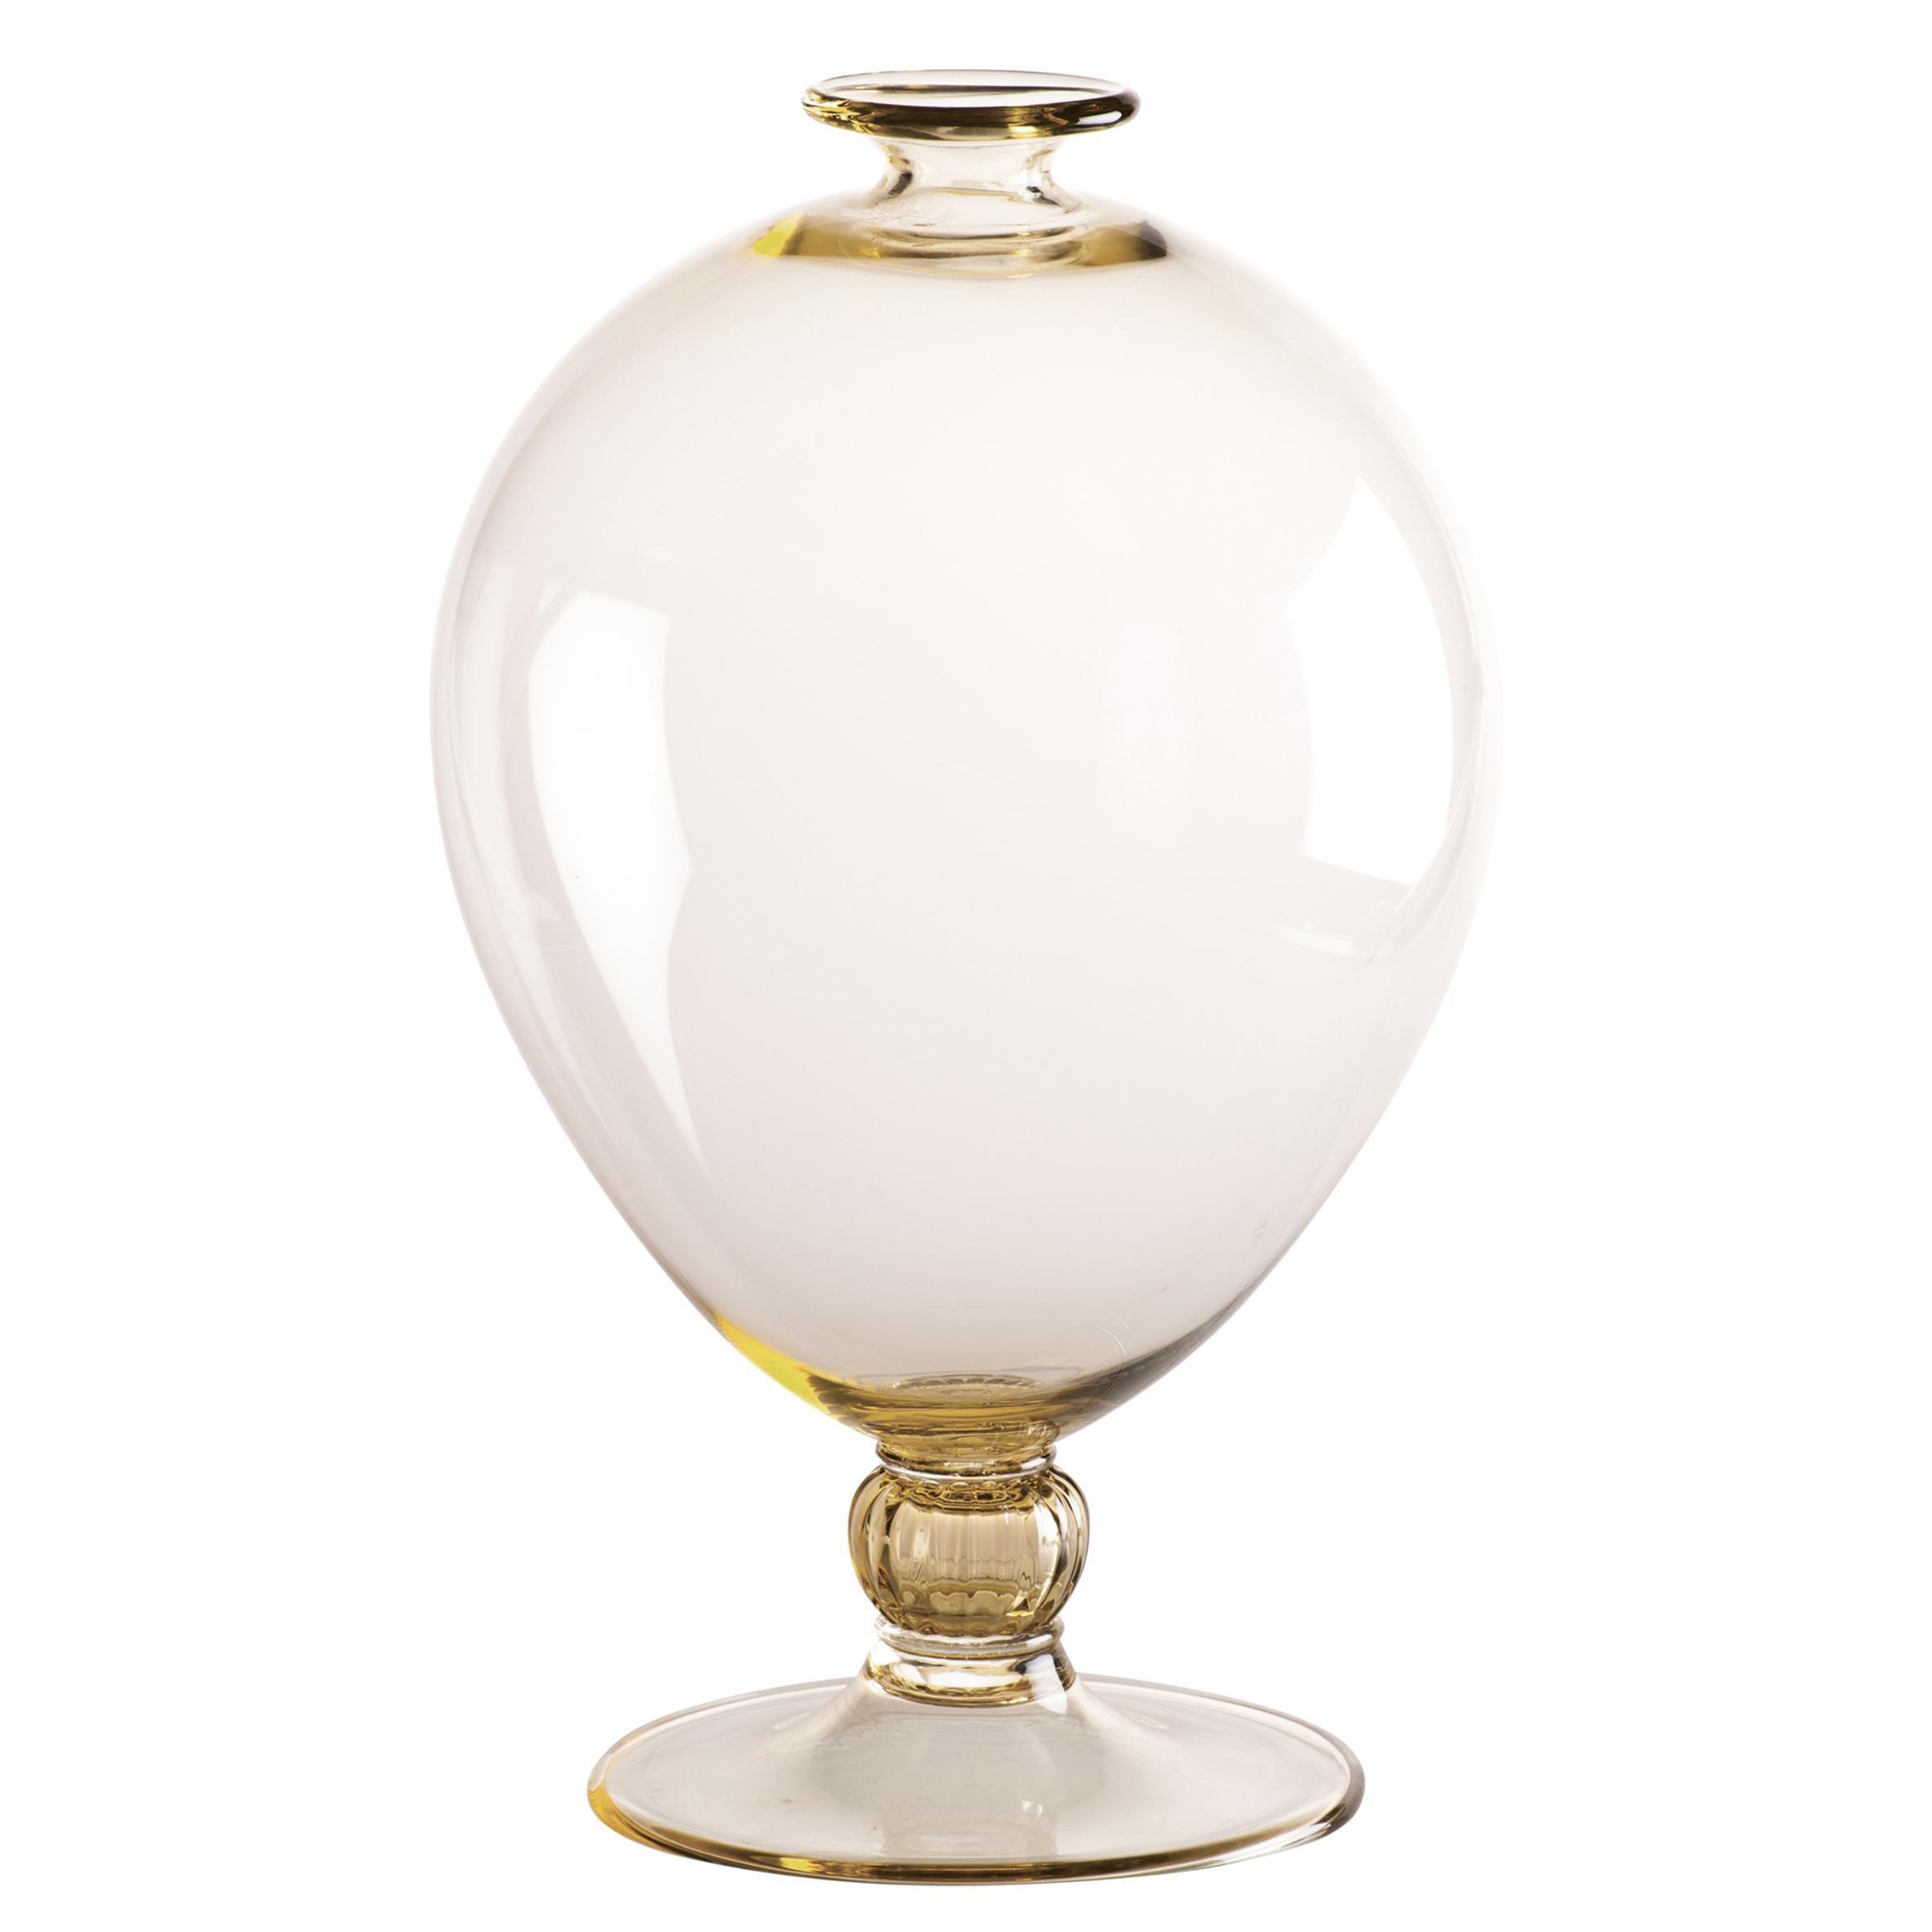 Venini Veronese Glass Vase in Straw and Crystal by Vittorio Zecchin